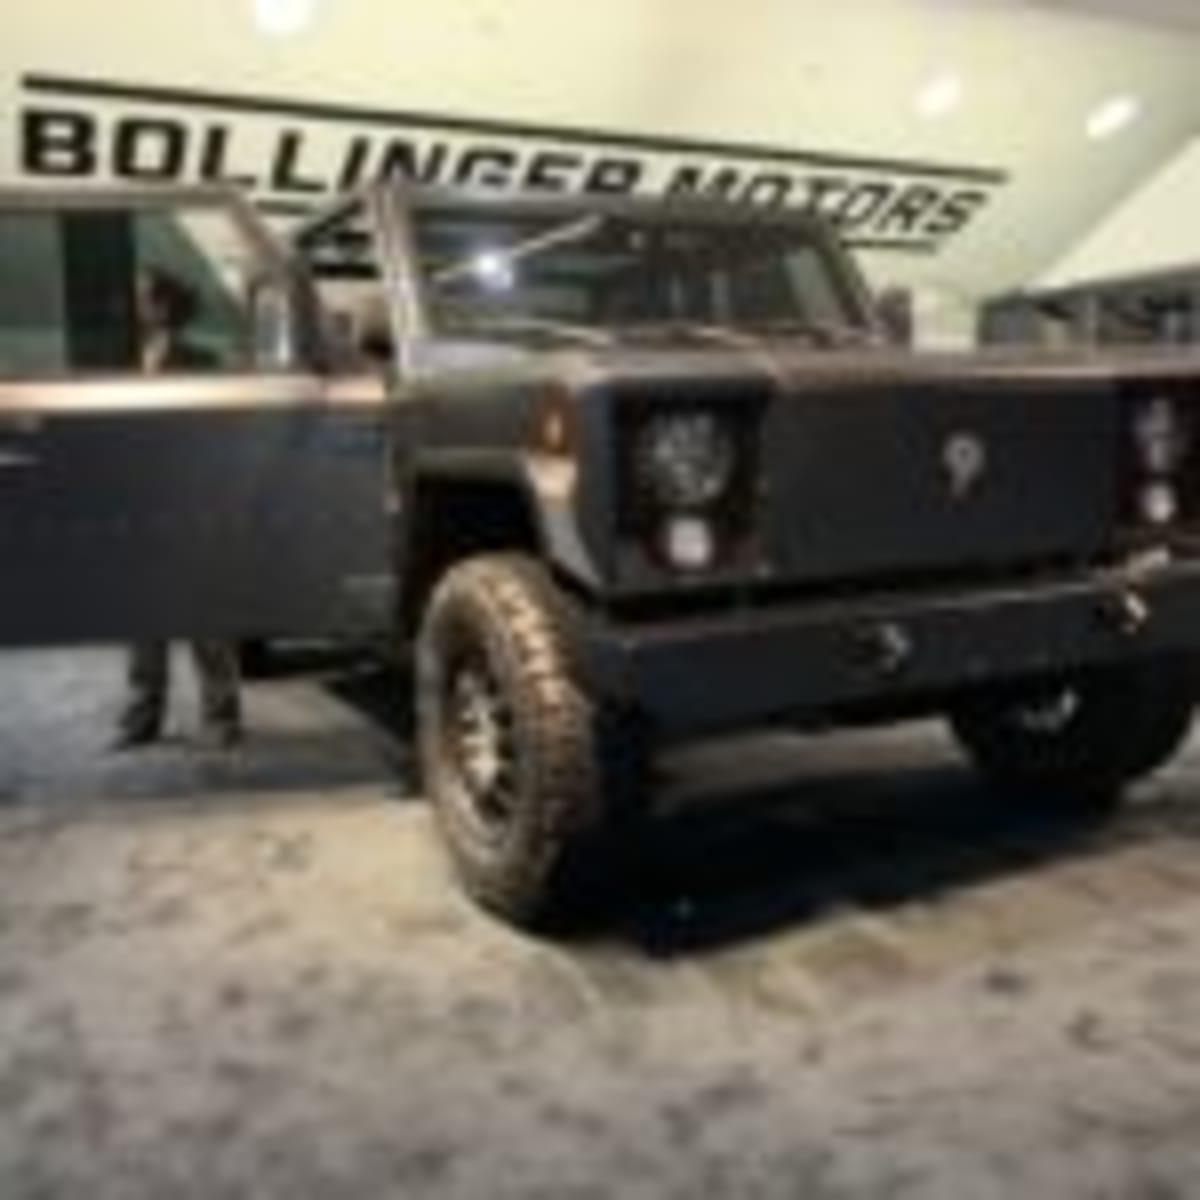 Bollinger's B2 pickup truck makes its auto show debut (Nakano)